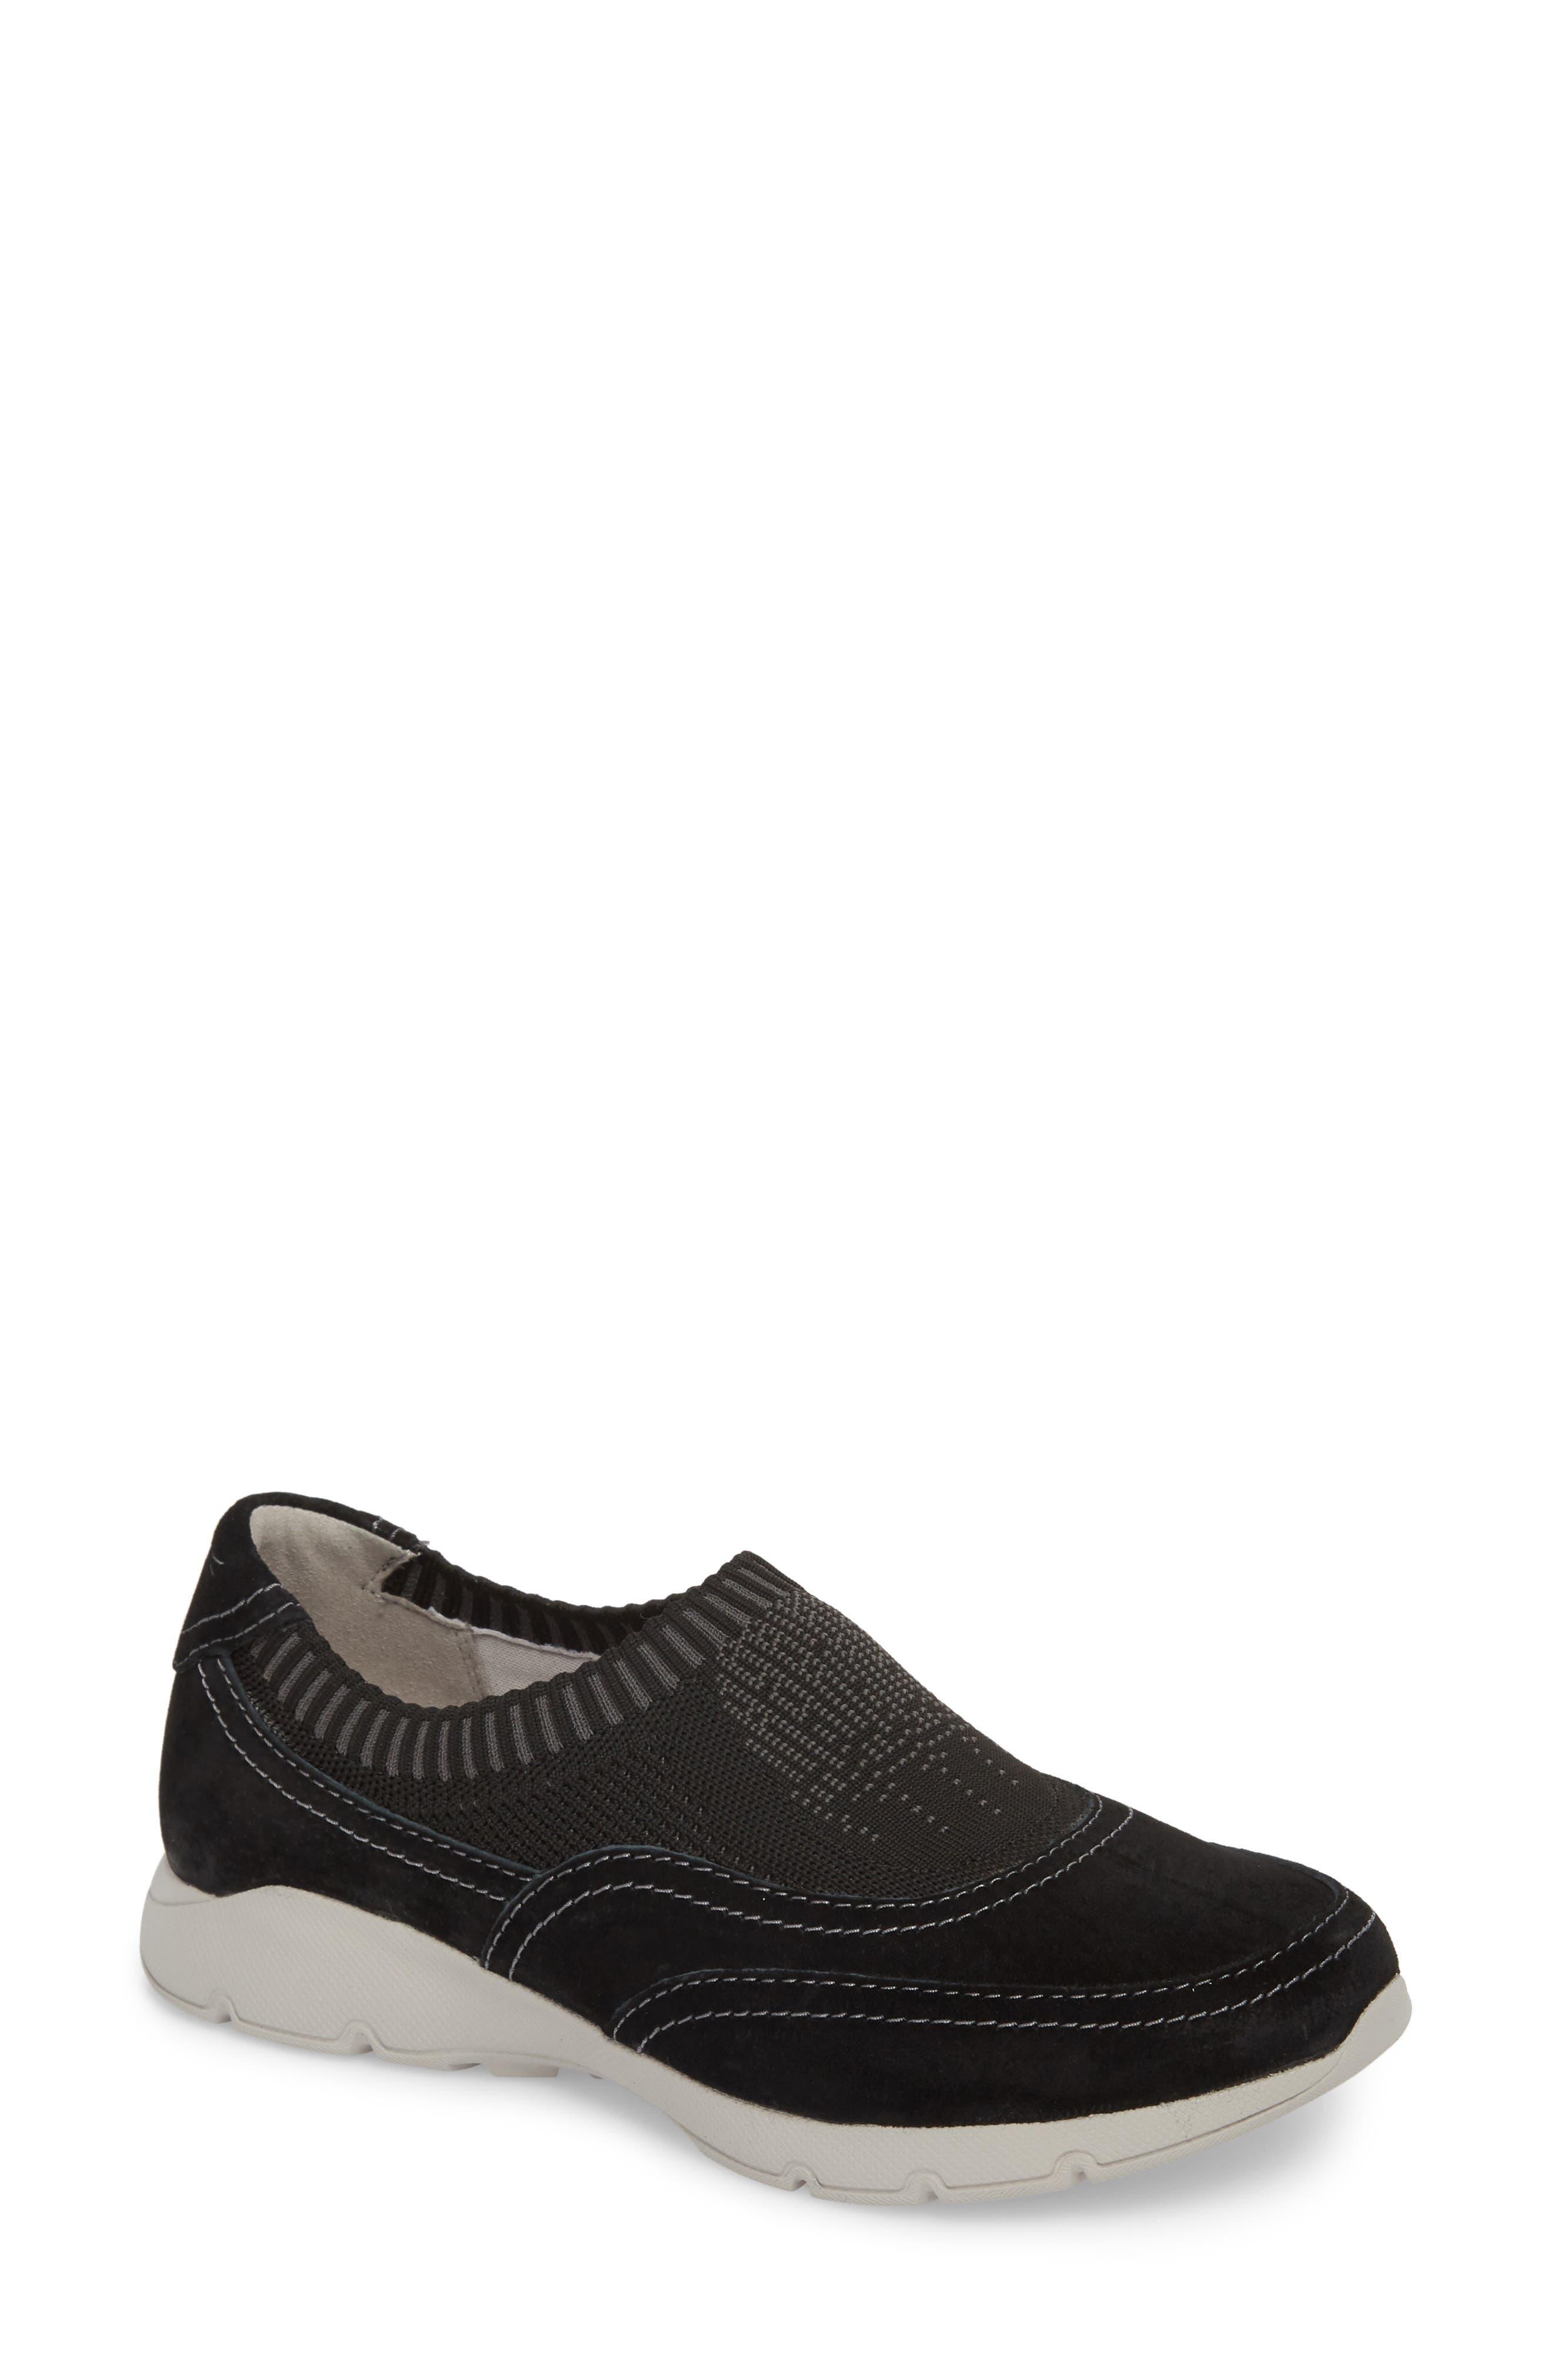 Alice Slip-On Sneaker,                         Main,                         color, Black Suede